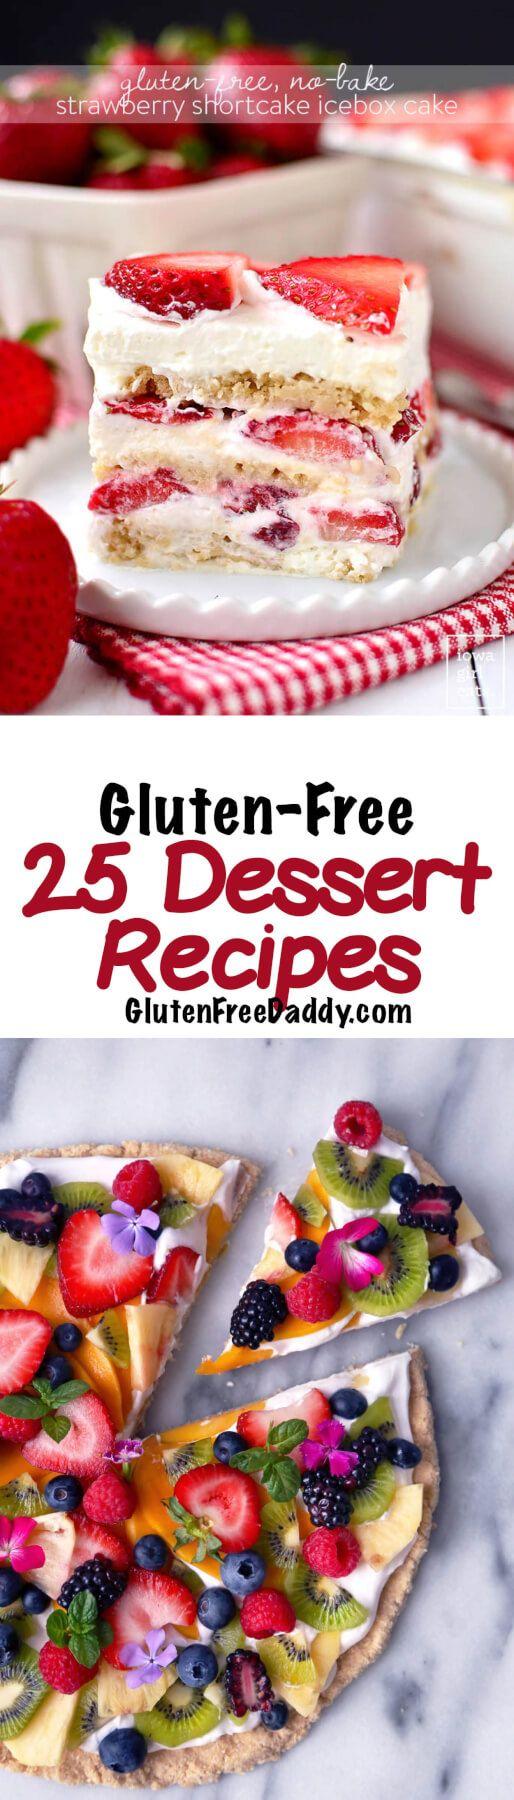 The 25 Best Gluten Free Dessert Recipes